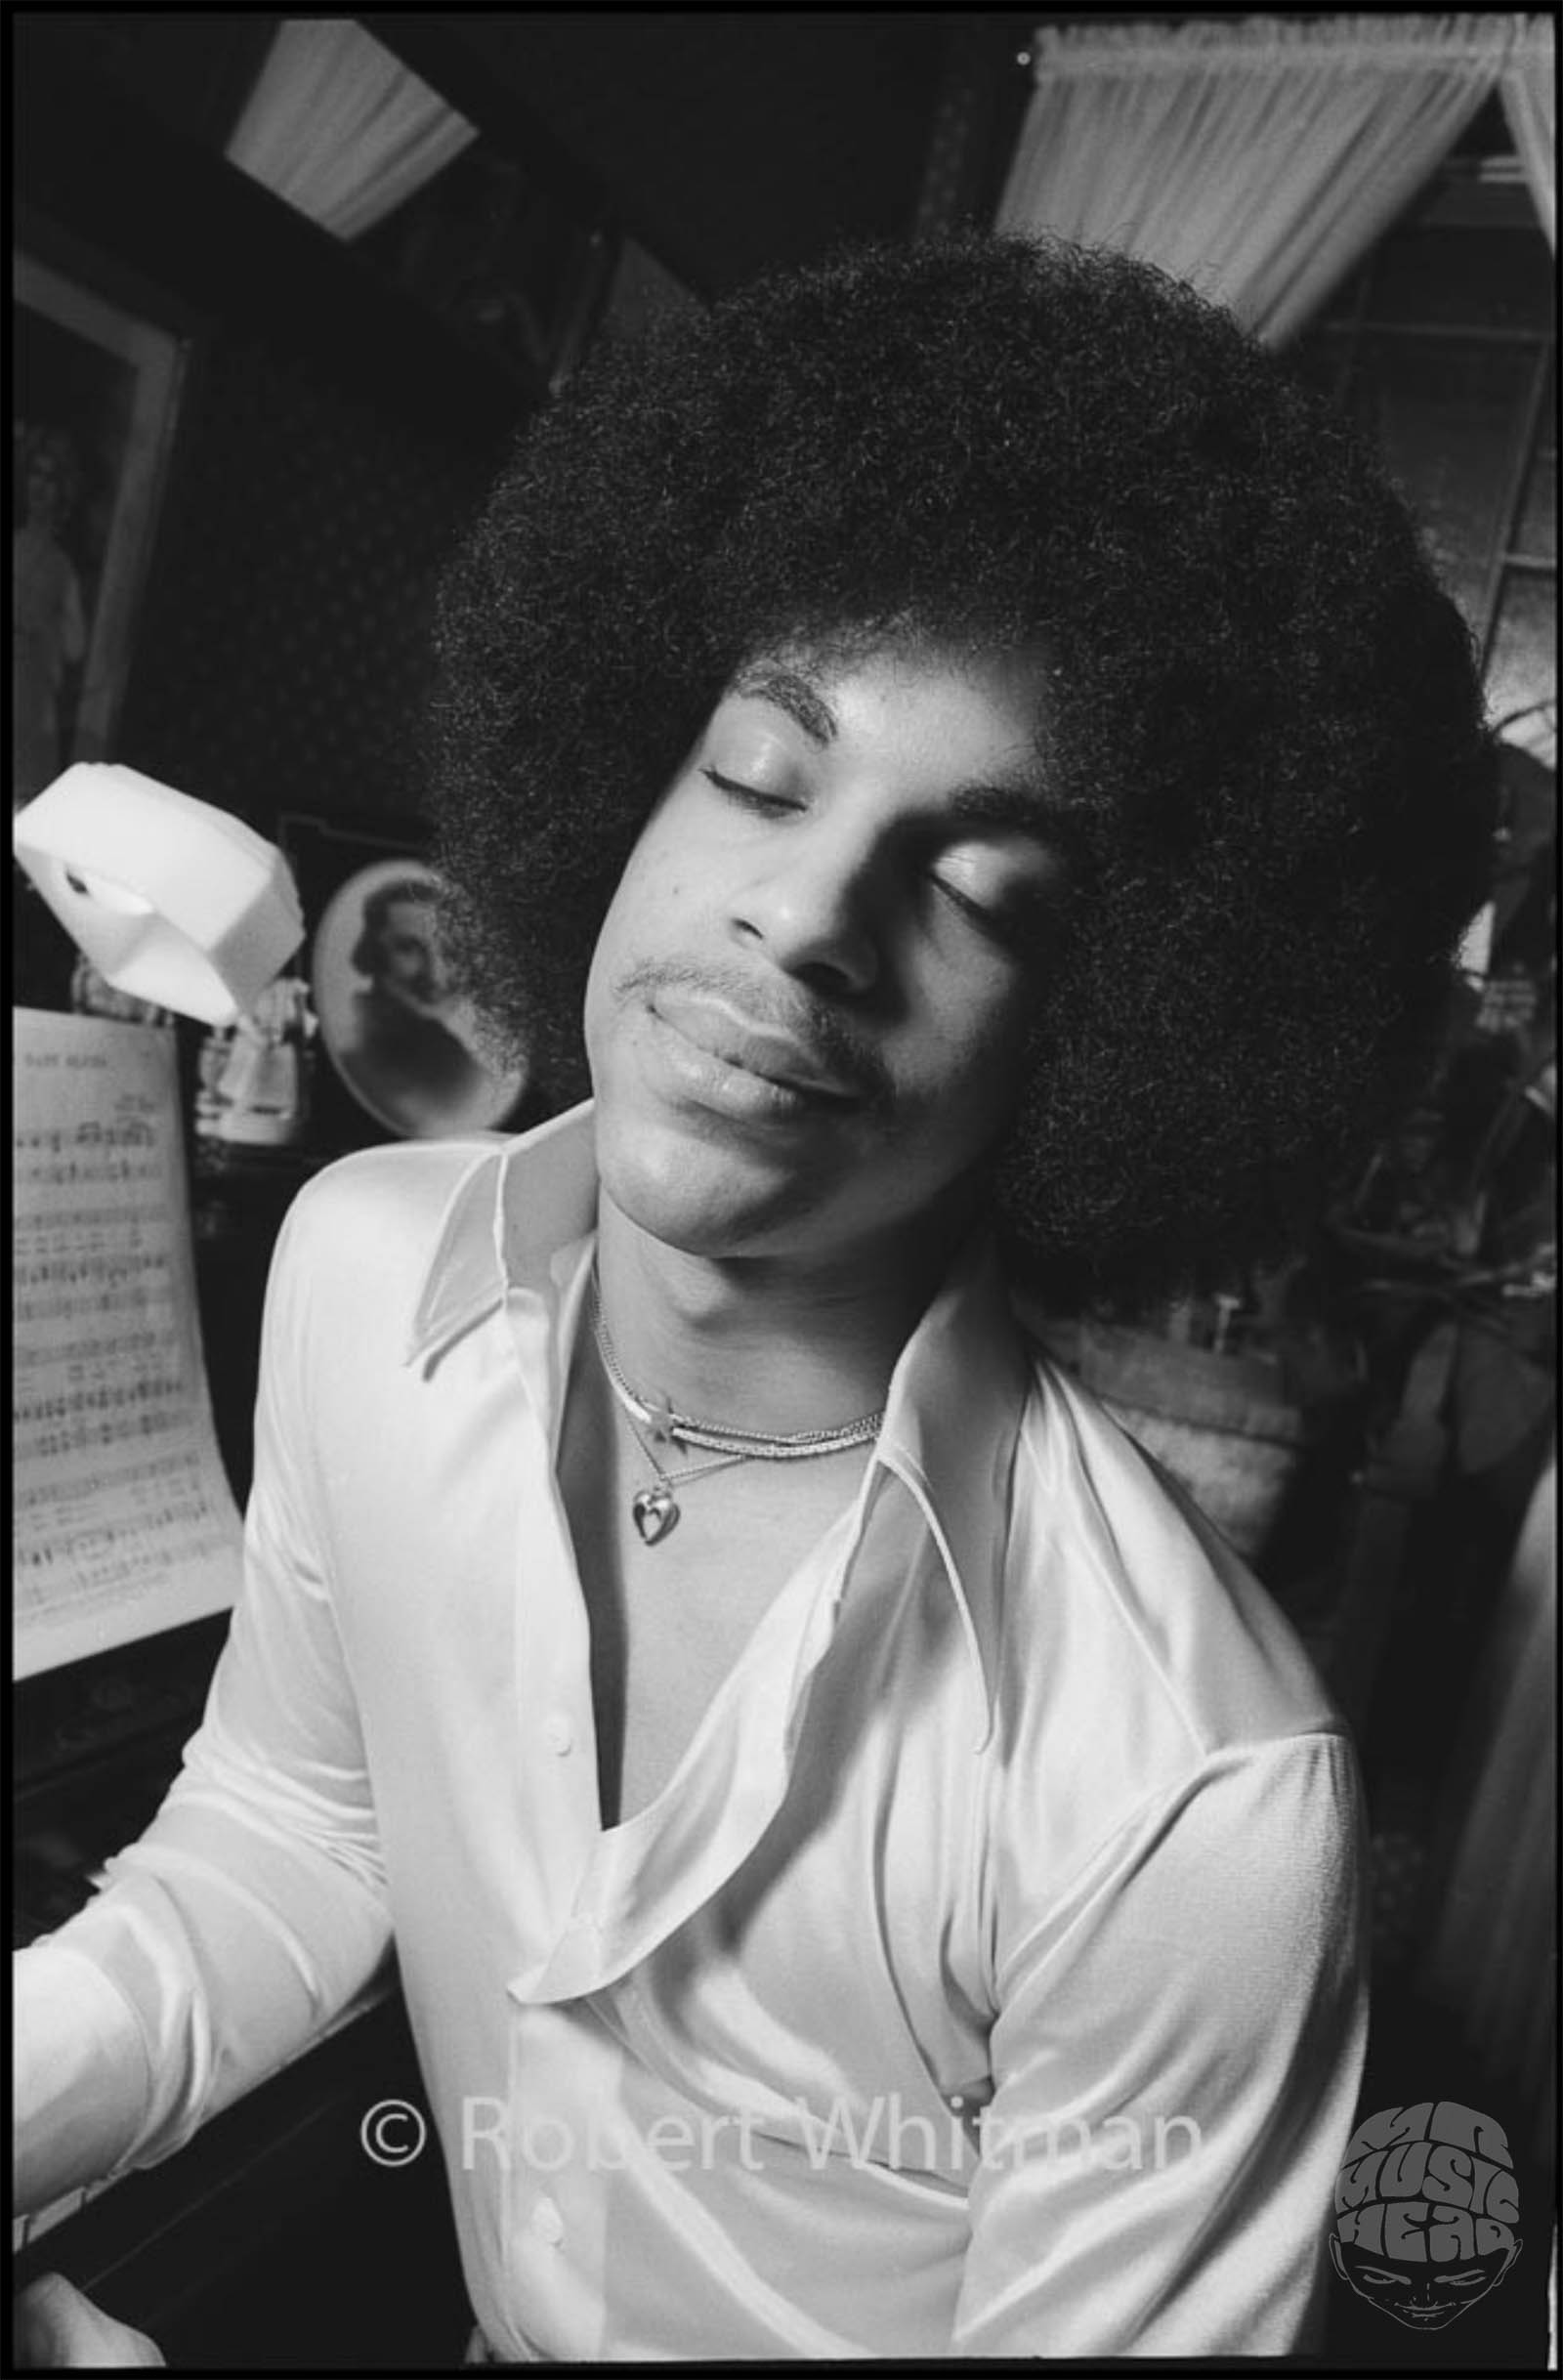 robert whitman_prince eyes closed.jpg